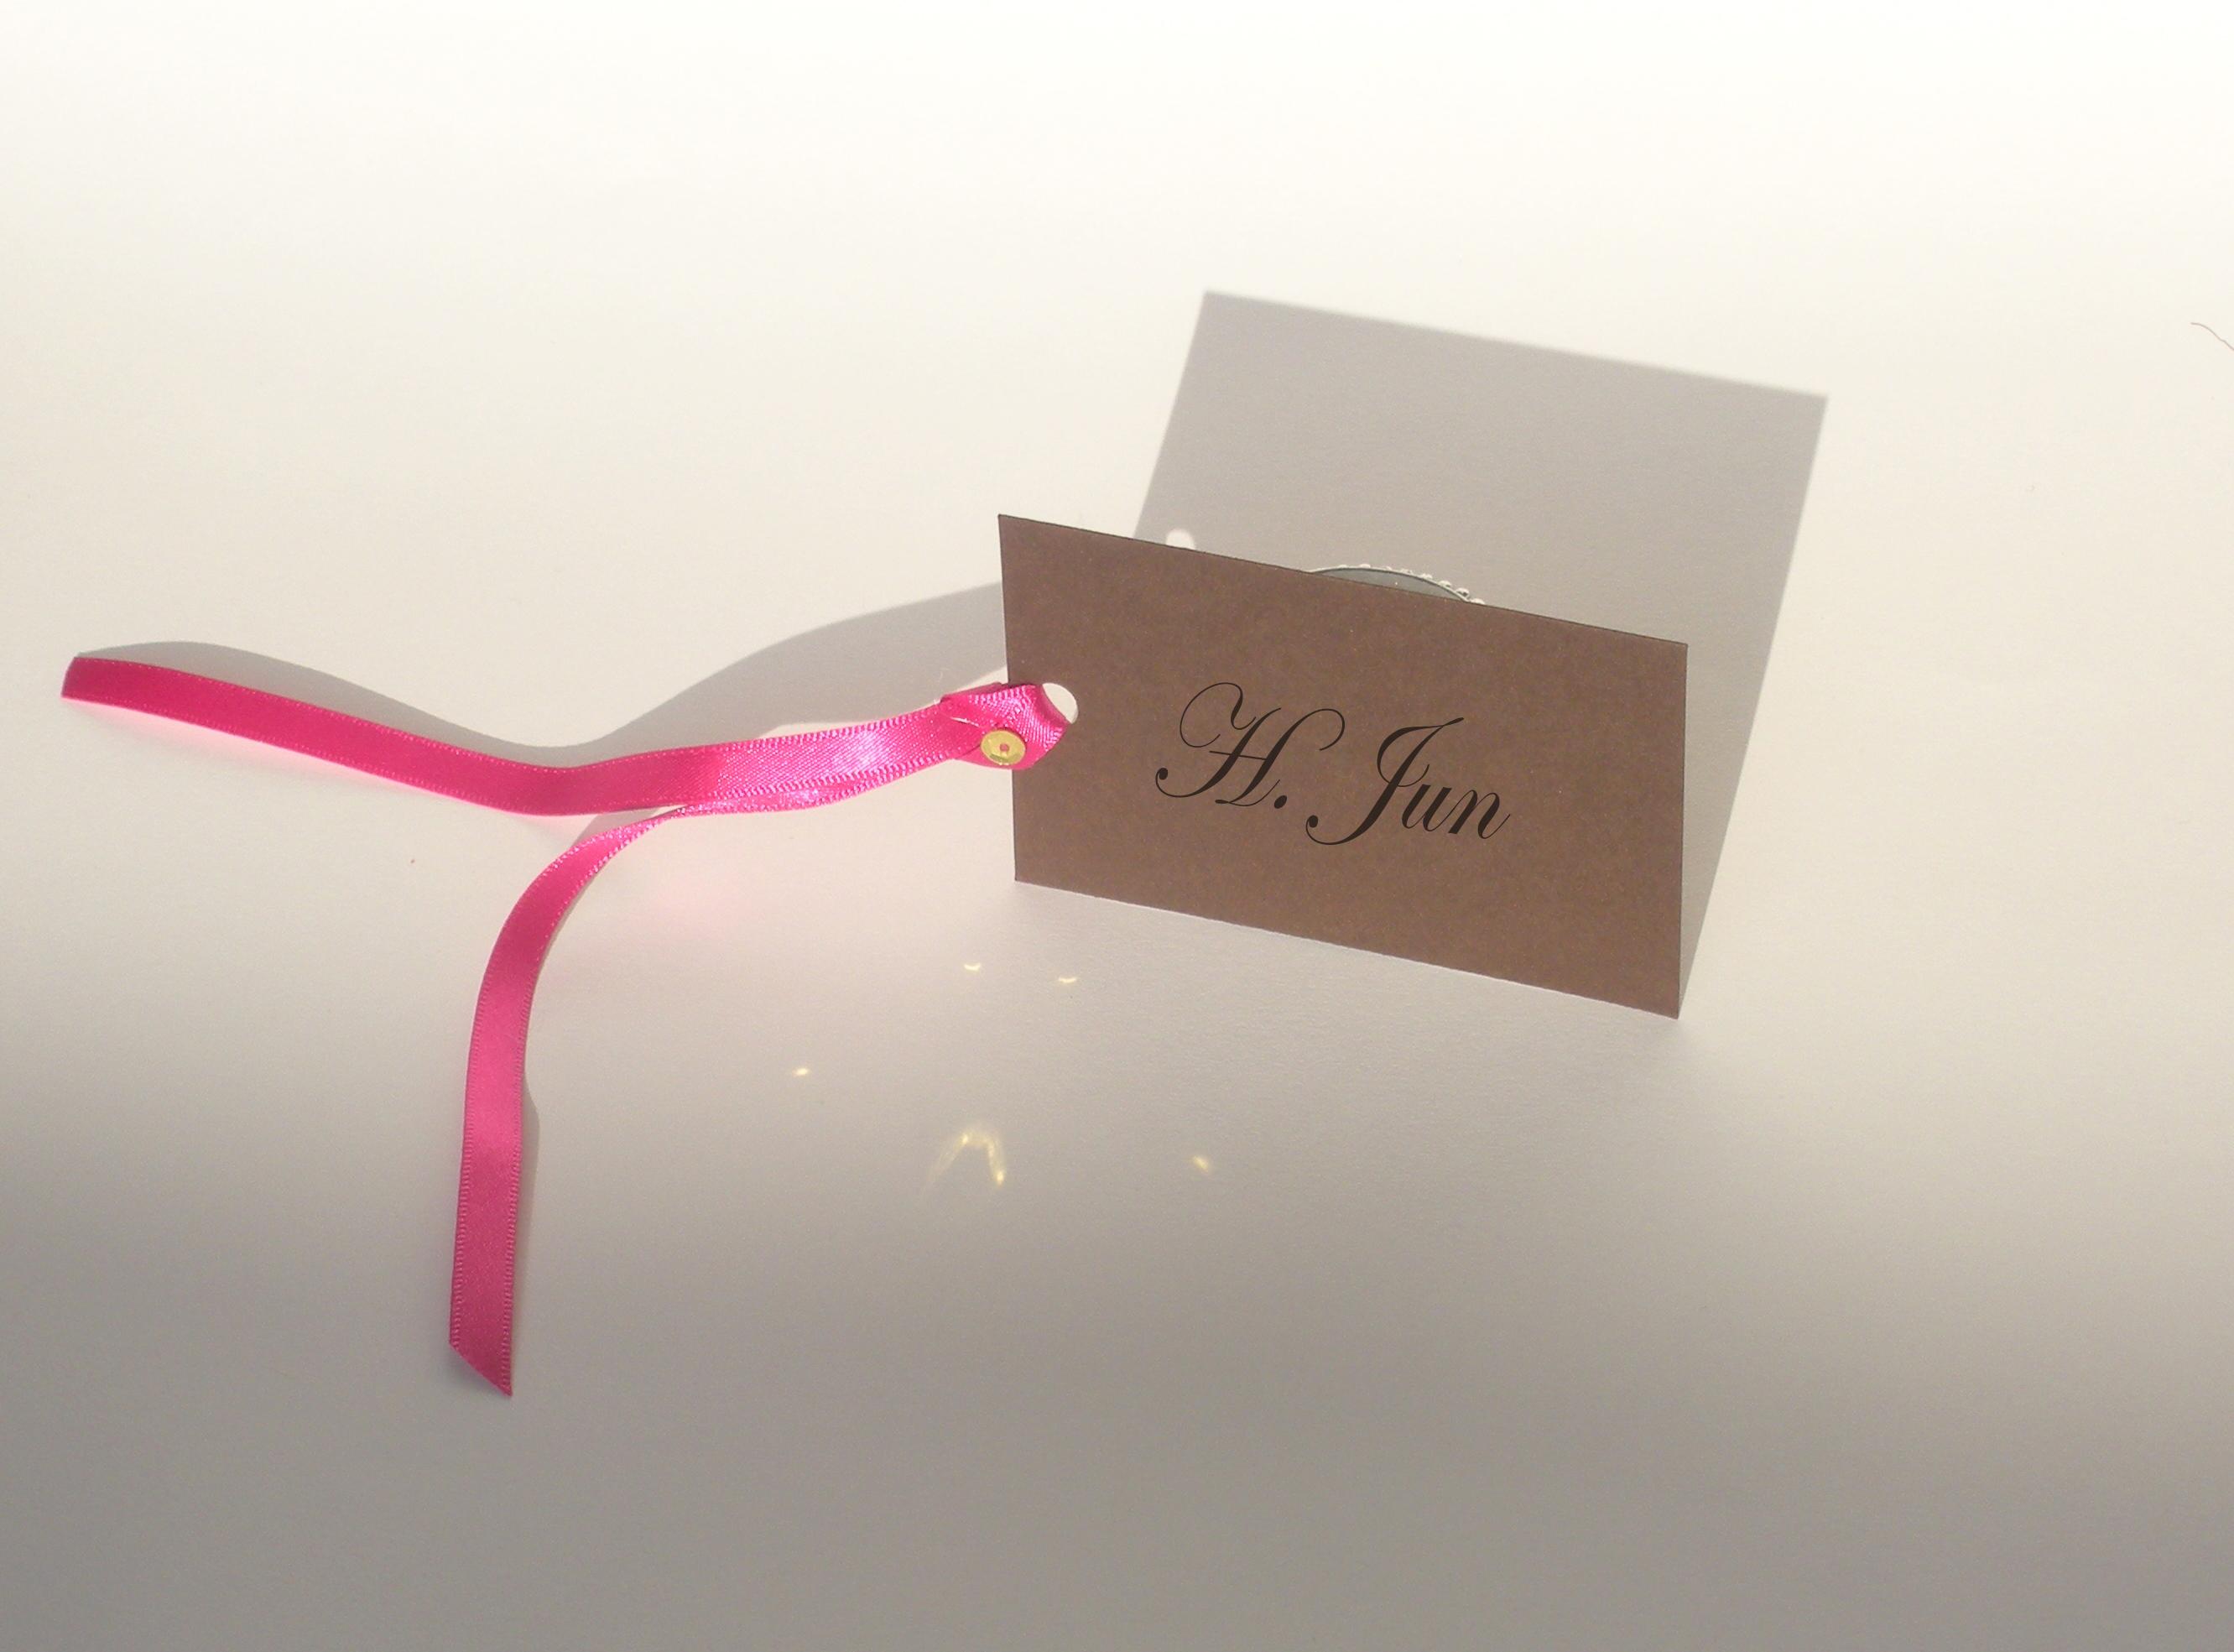 sefa escort card from GBP 1.00.jpg